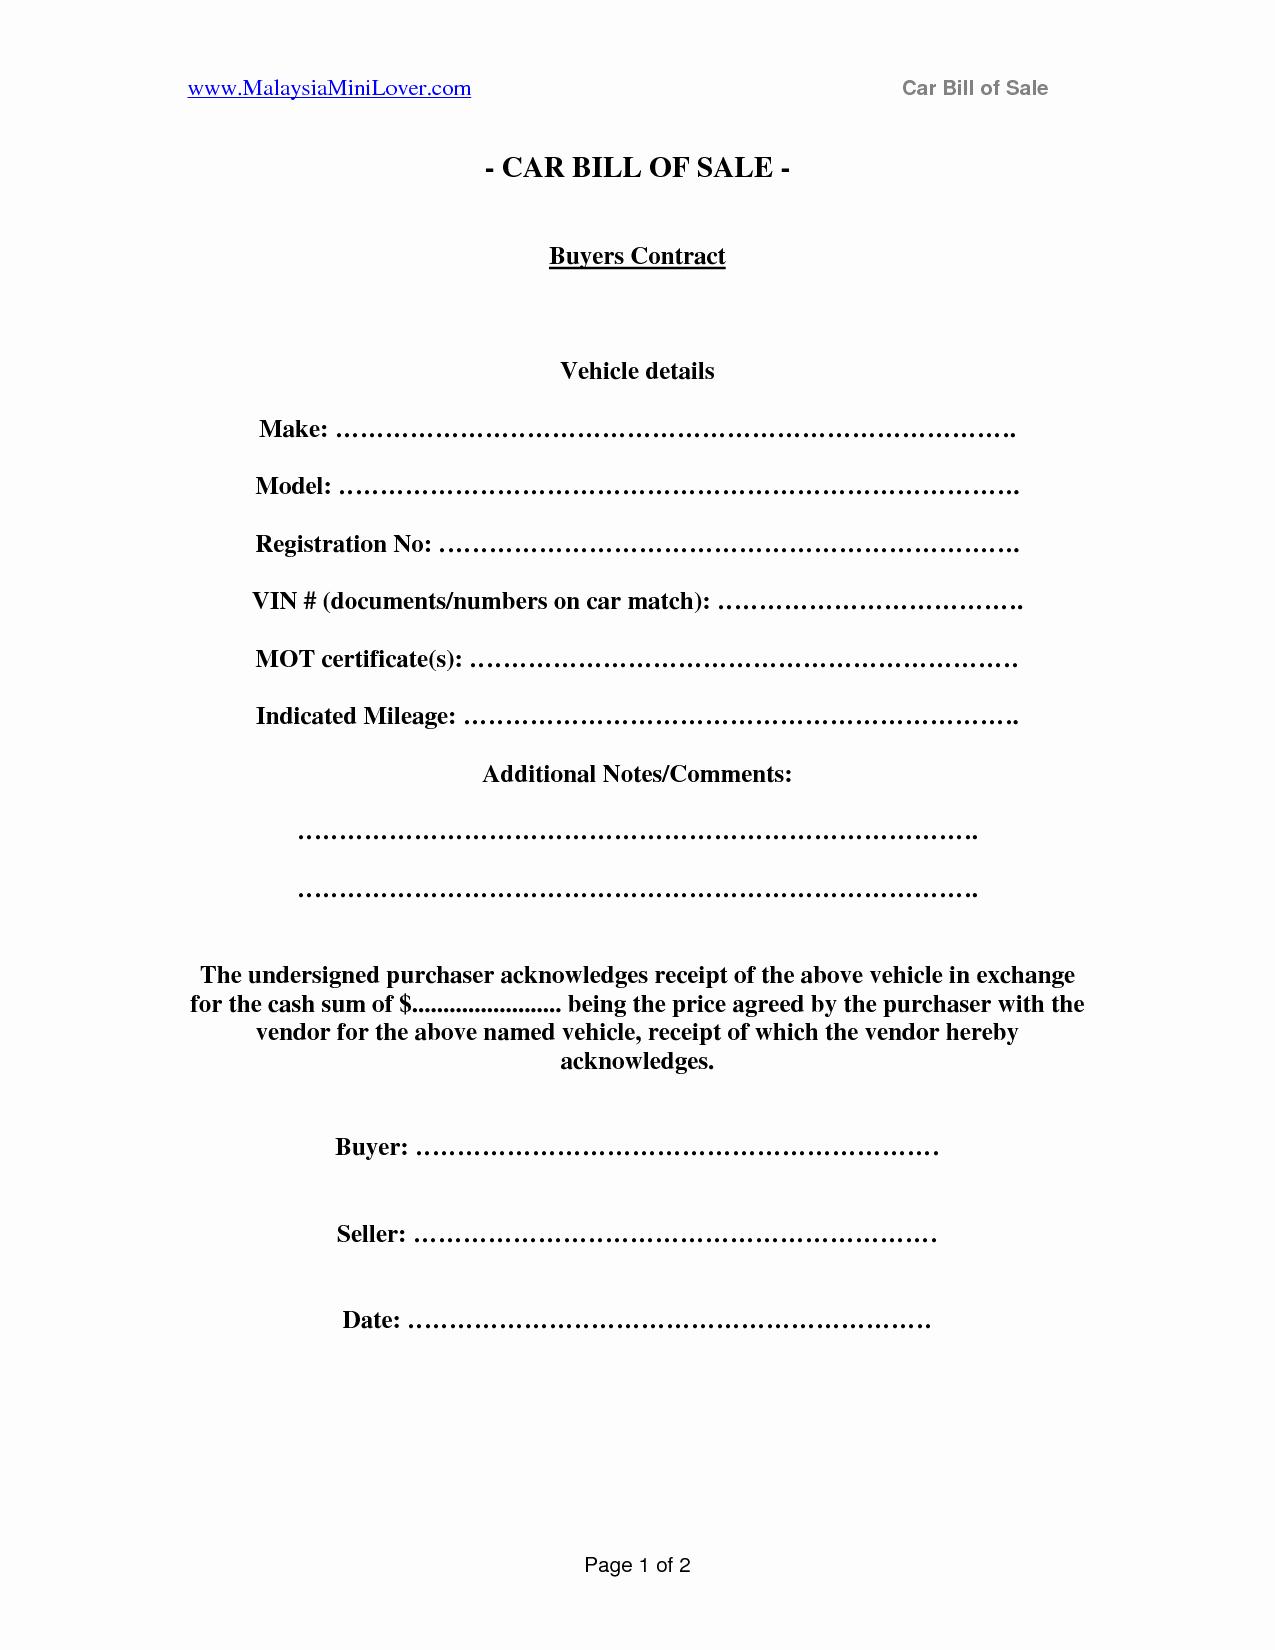 post private bill of sale template